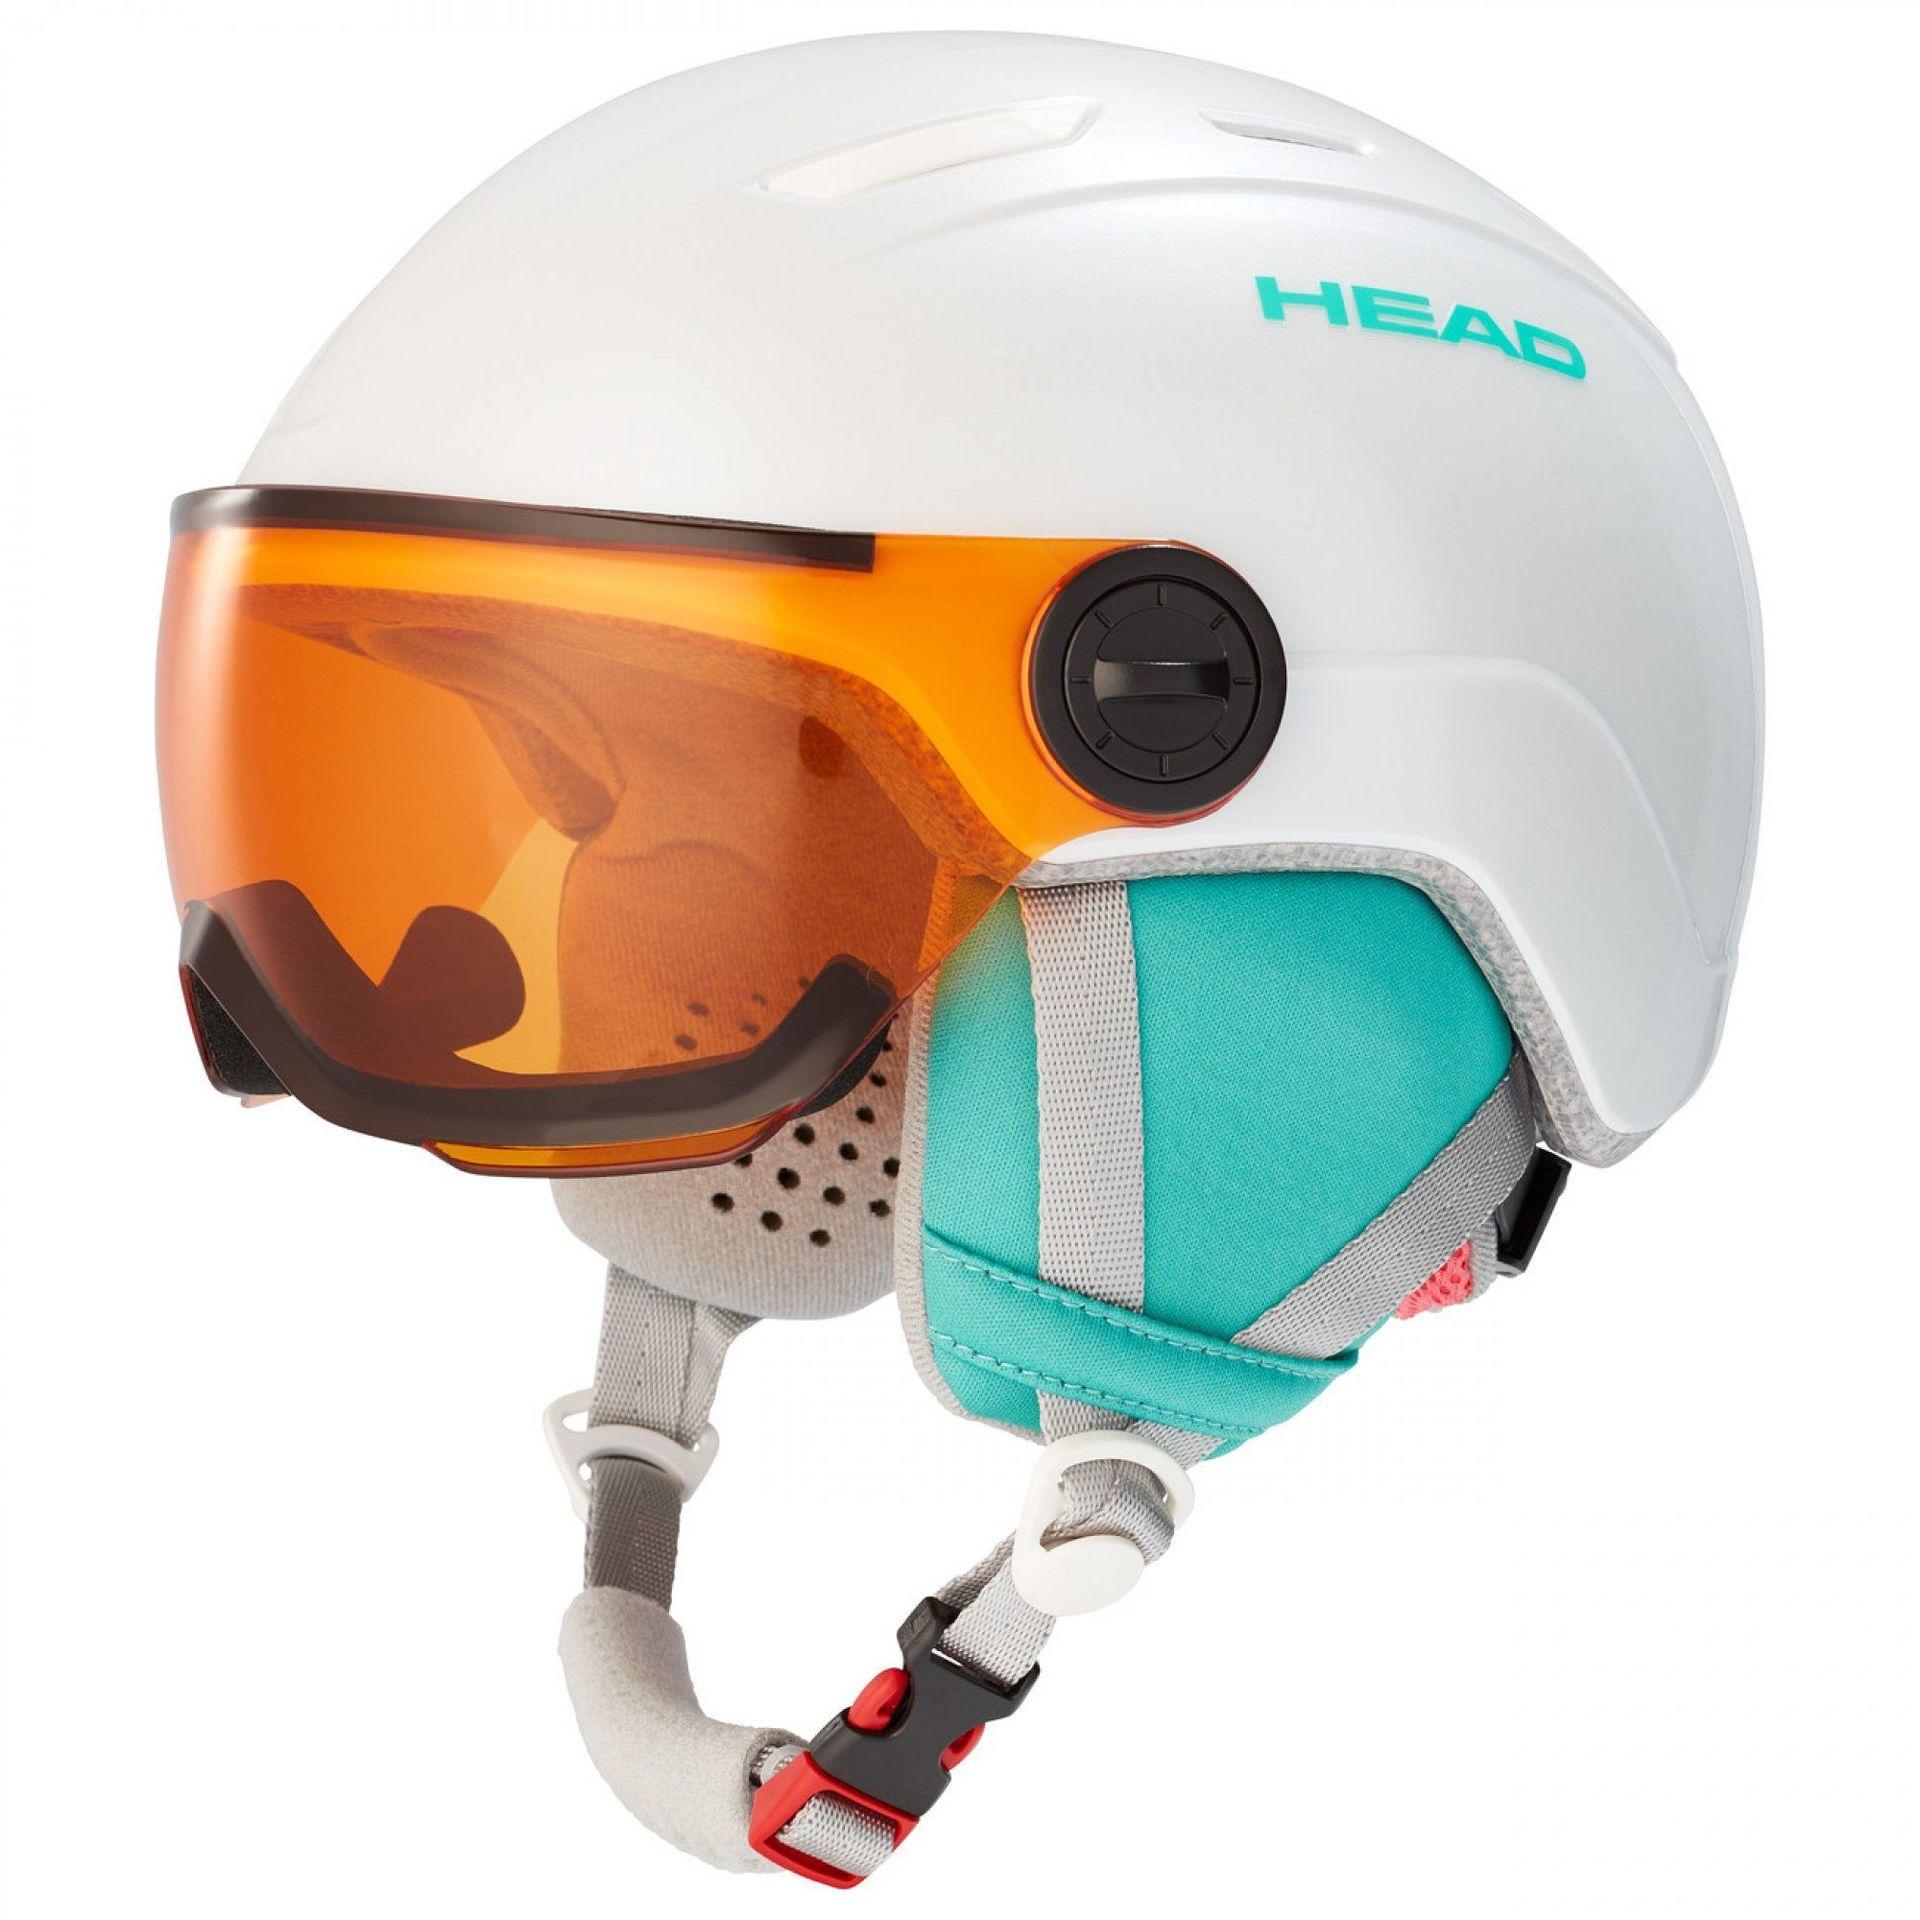 KASK HEAD MAJA VISOR 328169